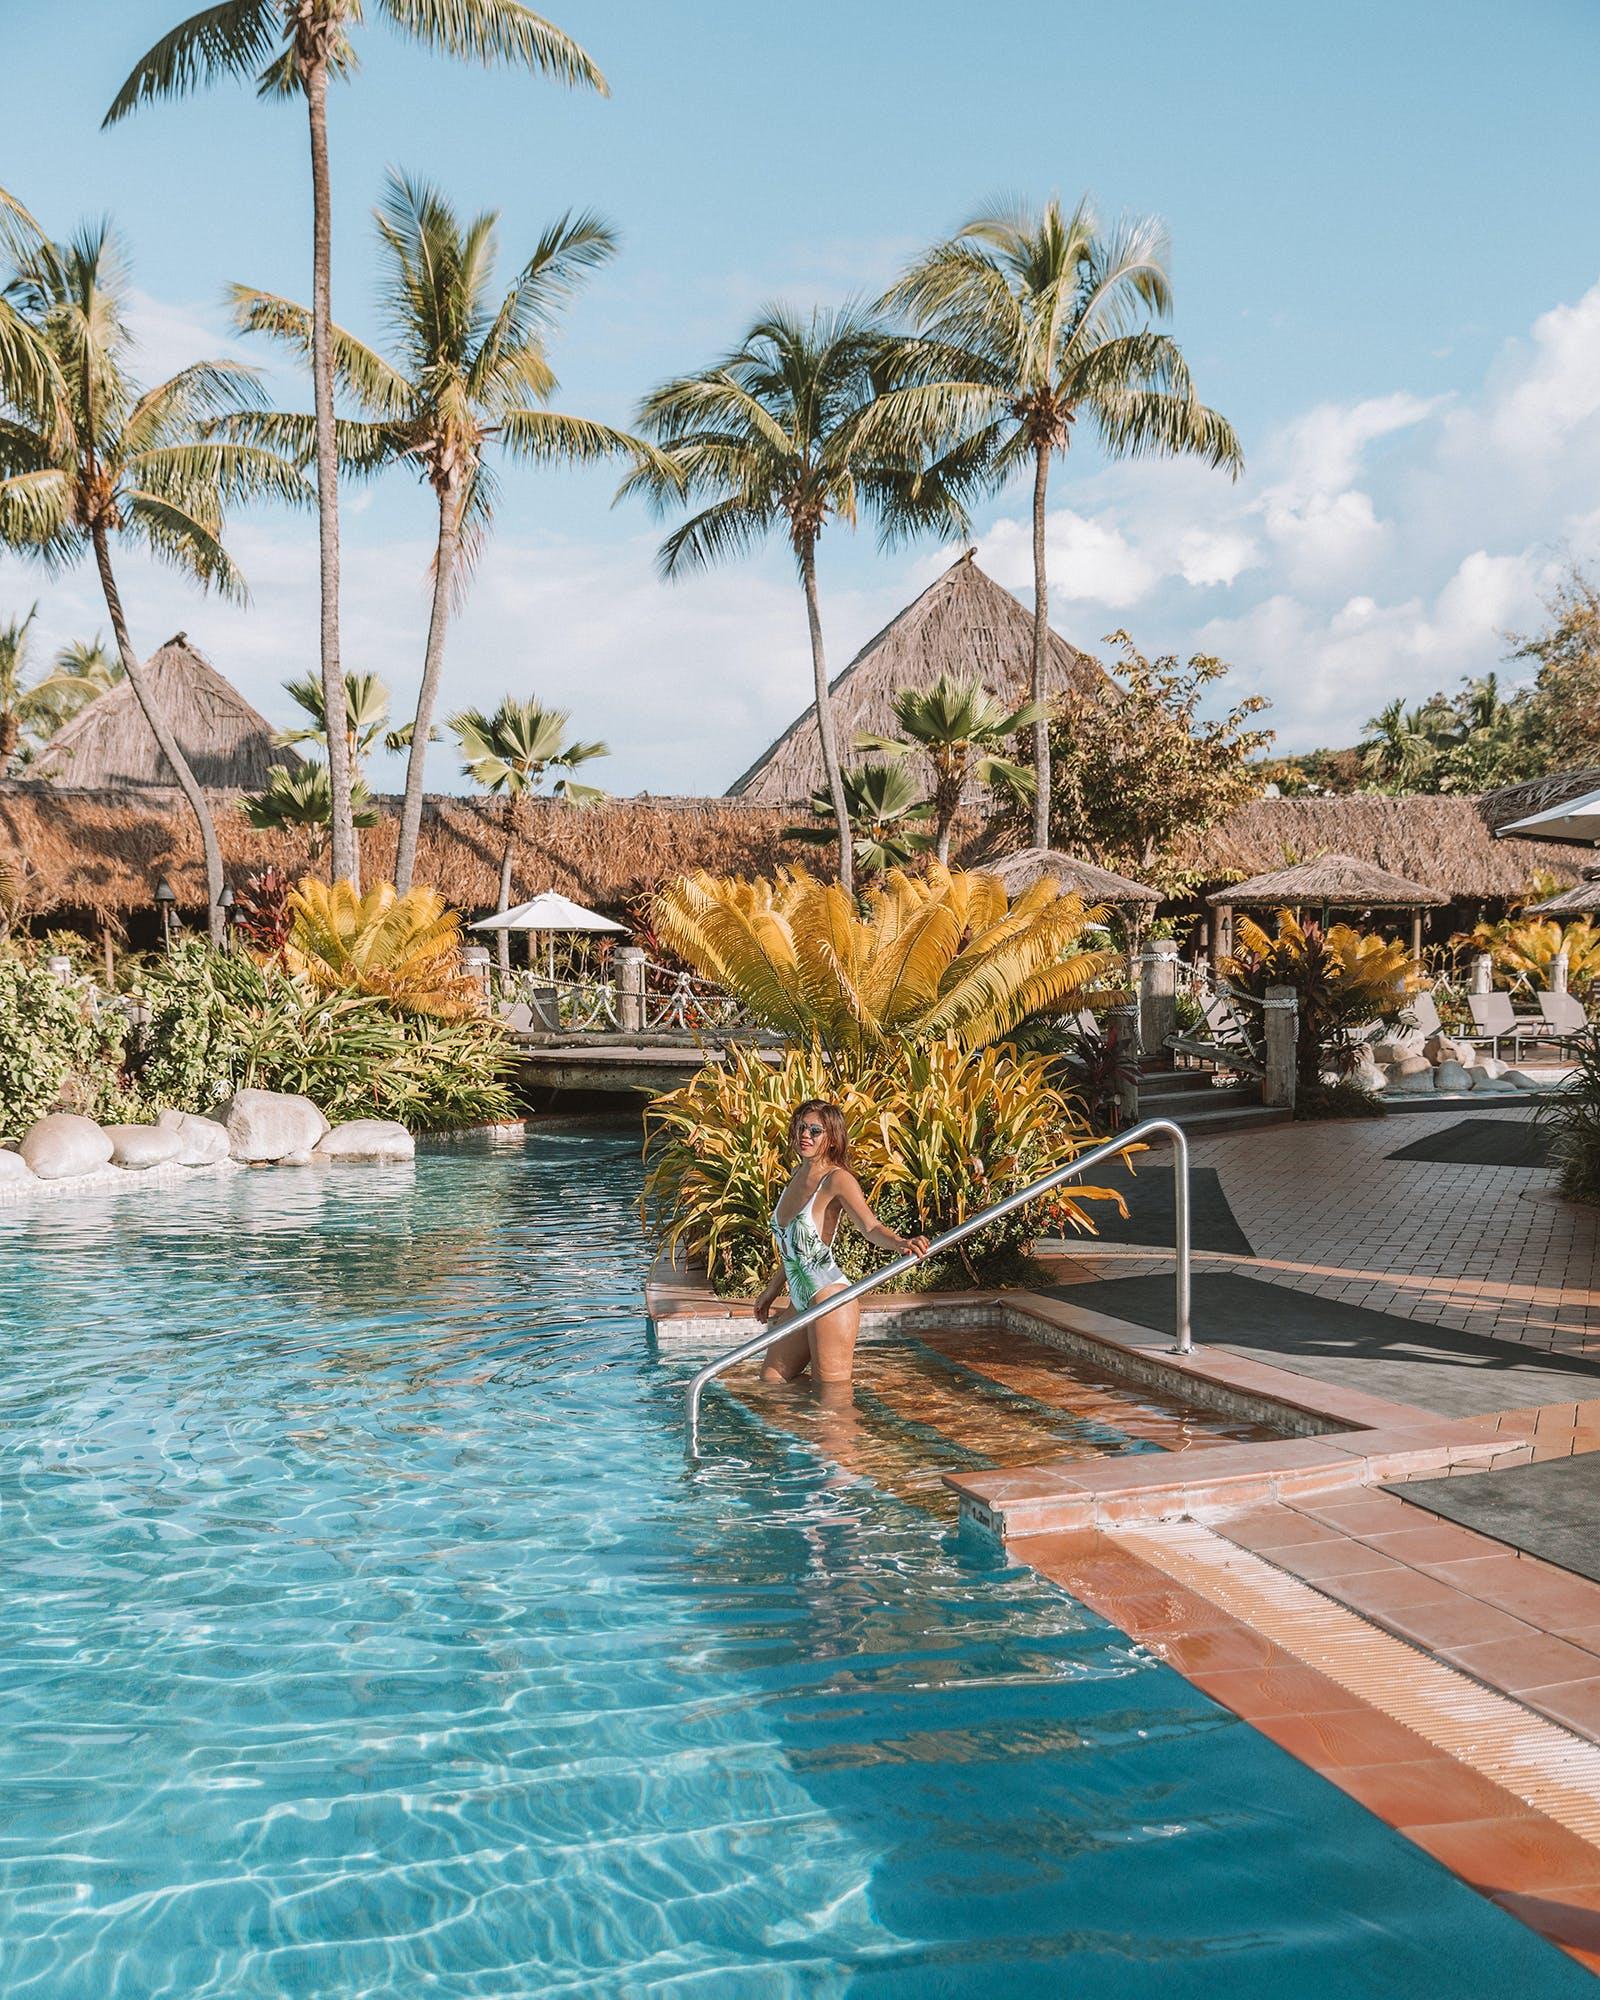 Fiji Beaches: Waking Up In Outrigger Beach Resort, Fiji